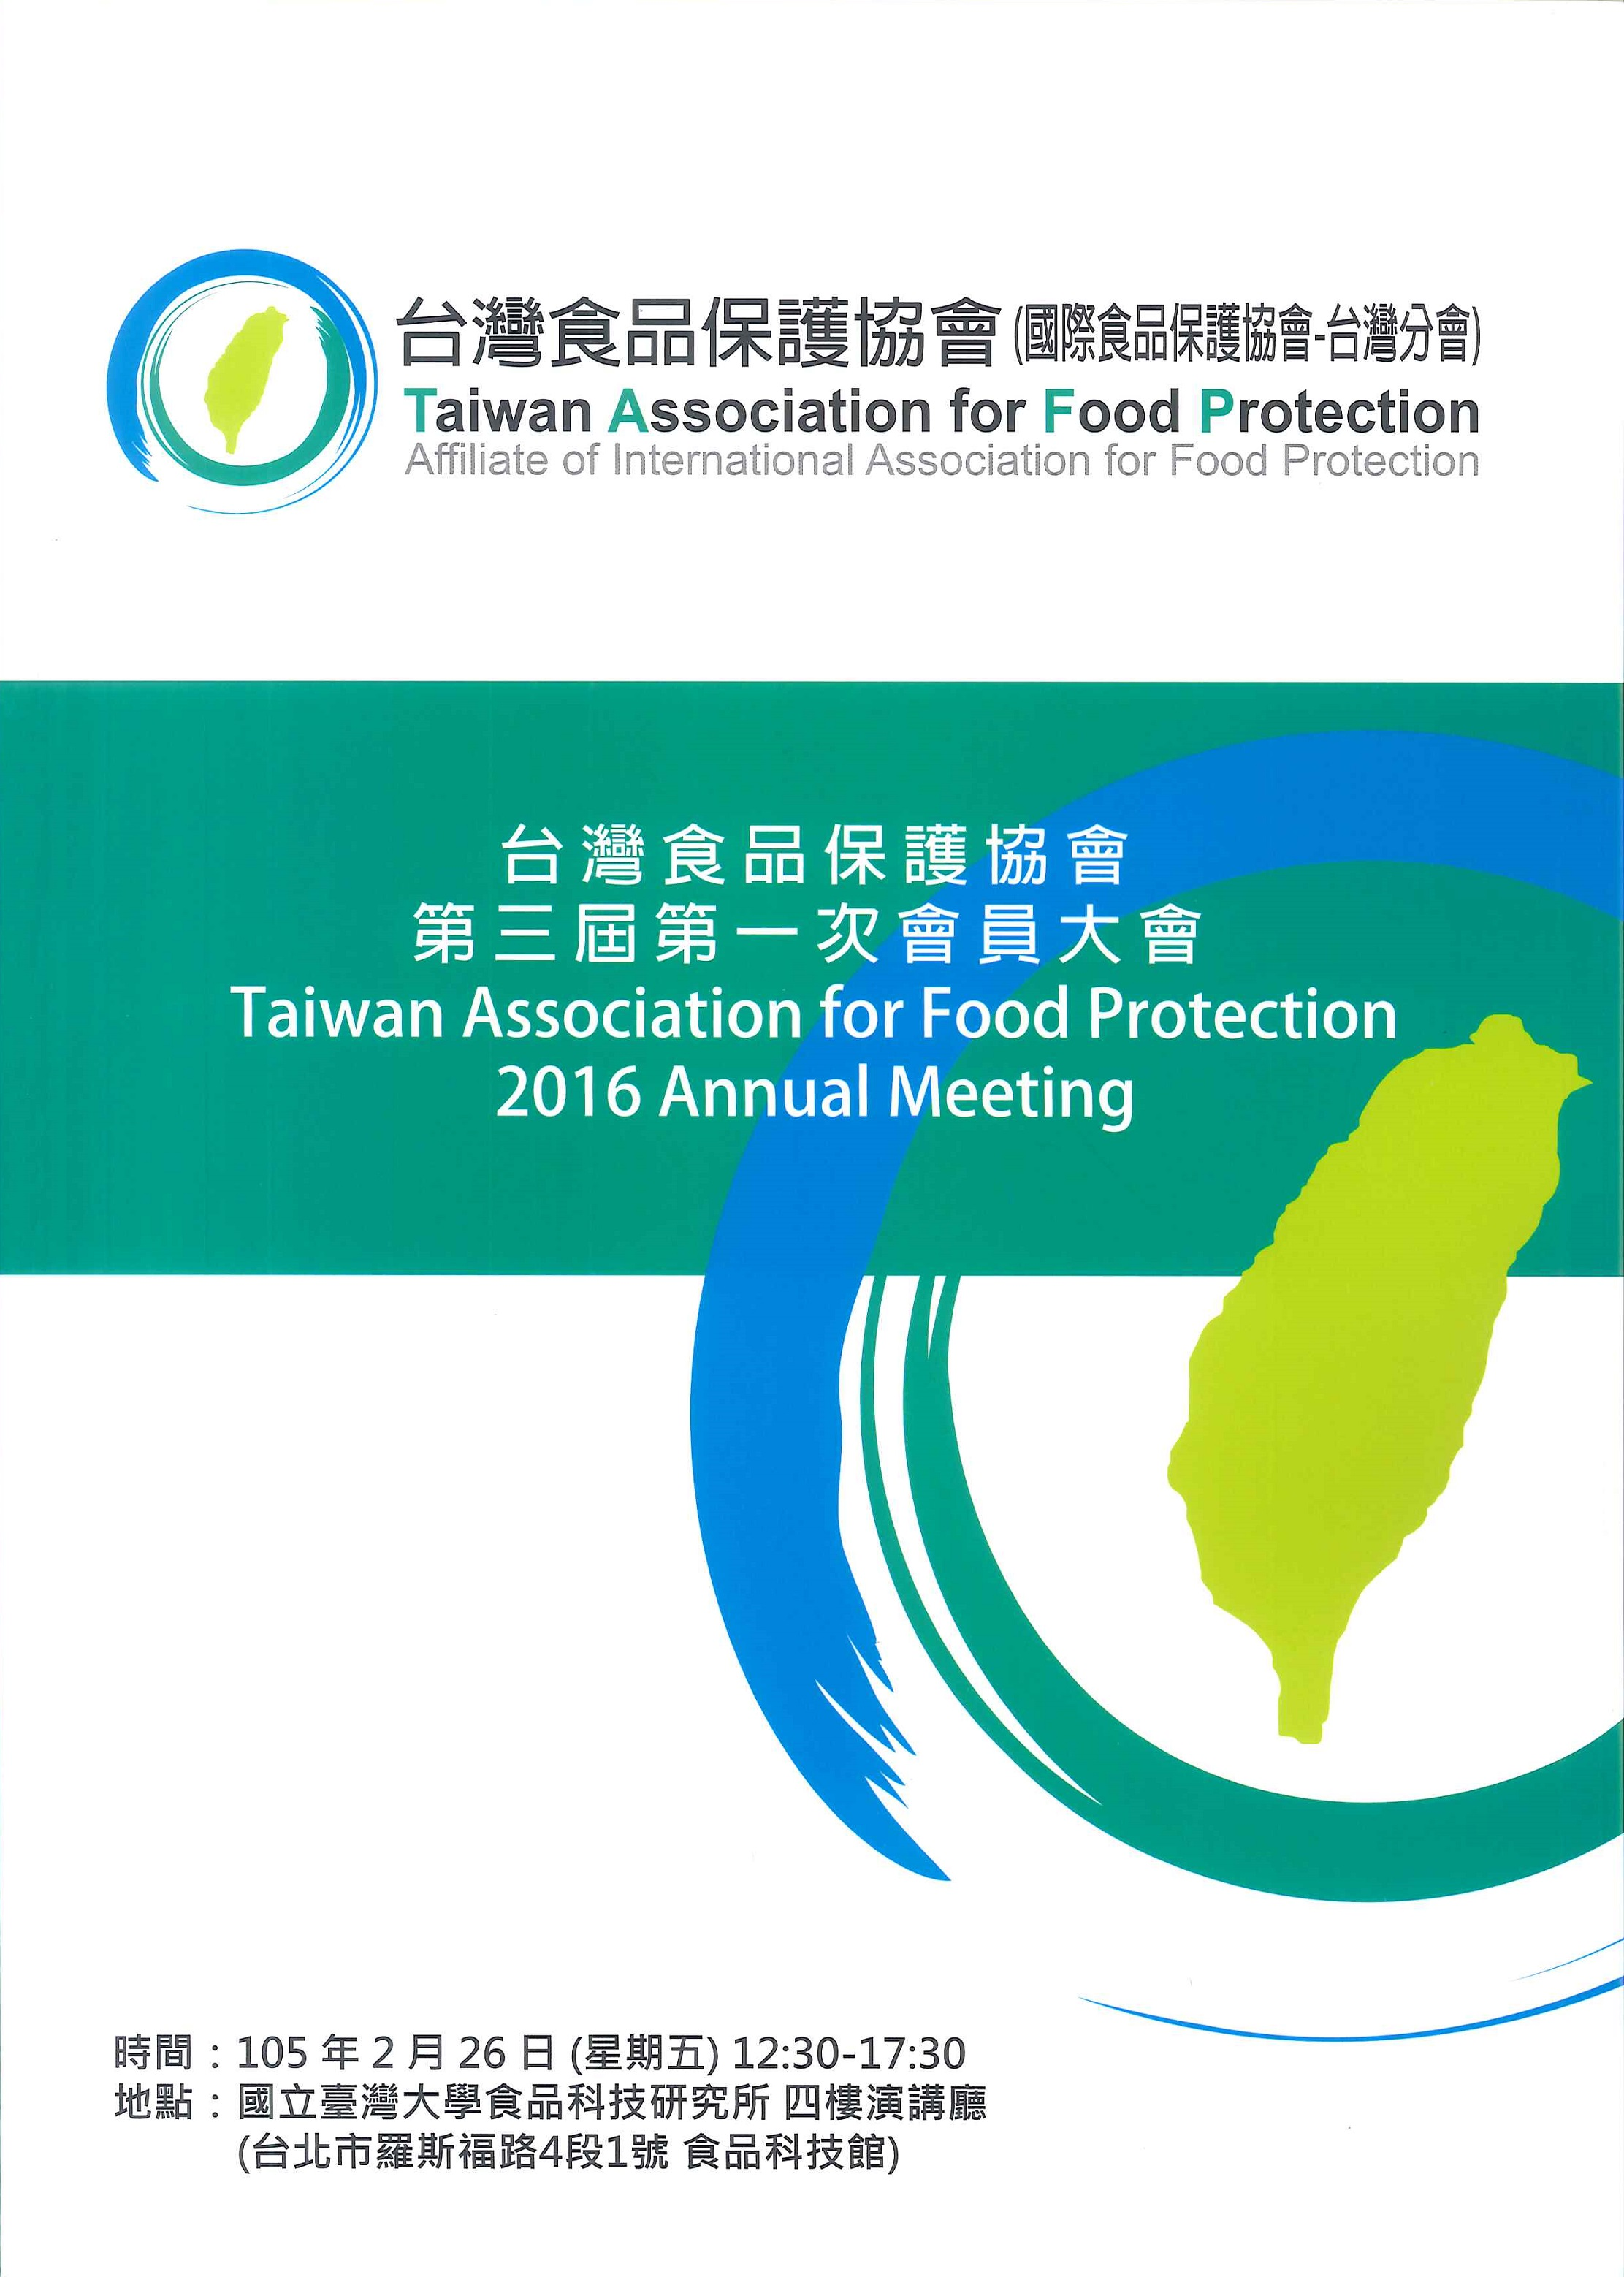 台灣食品保護協會第三屆第一次會員大會=Taiwan Association for Food Protection, 2016 annual meeting